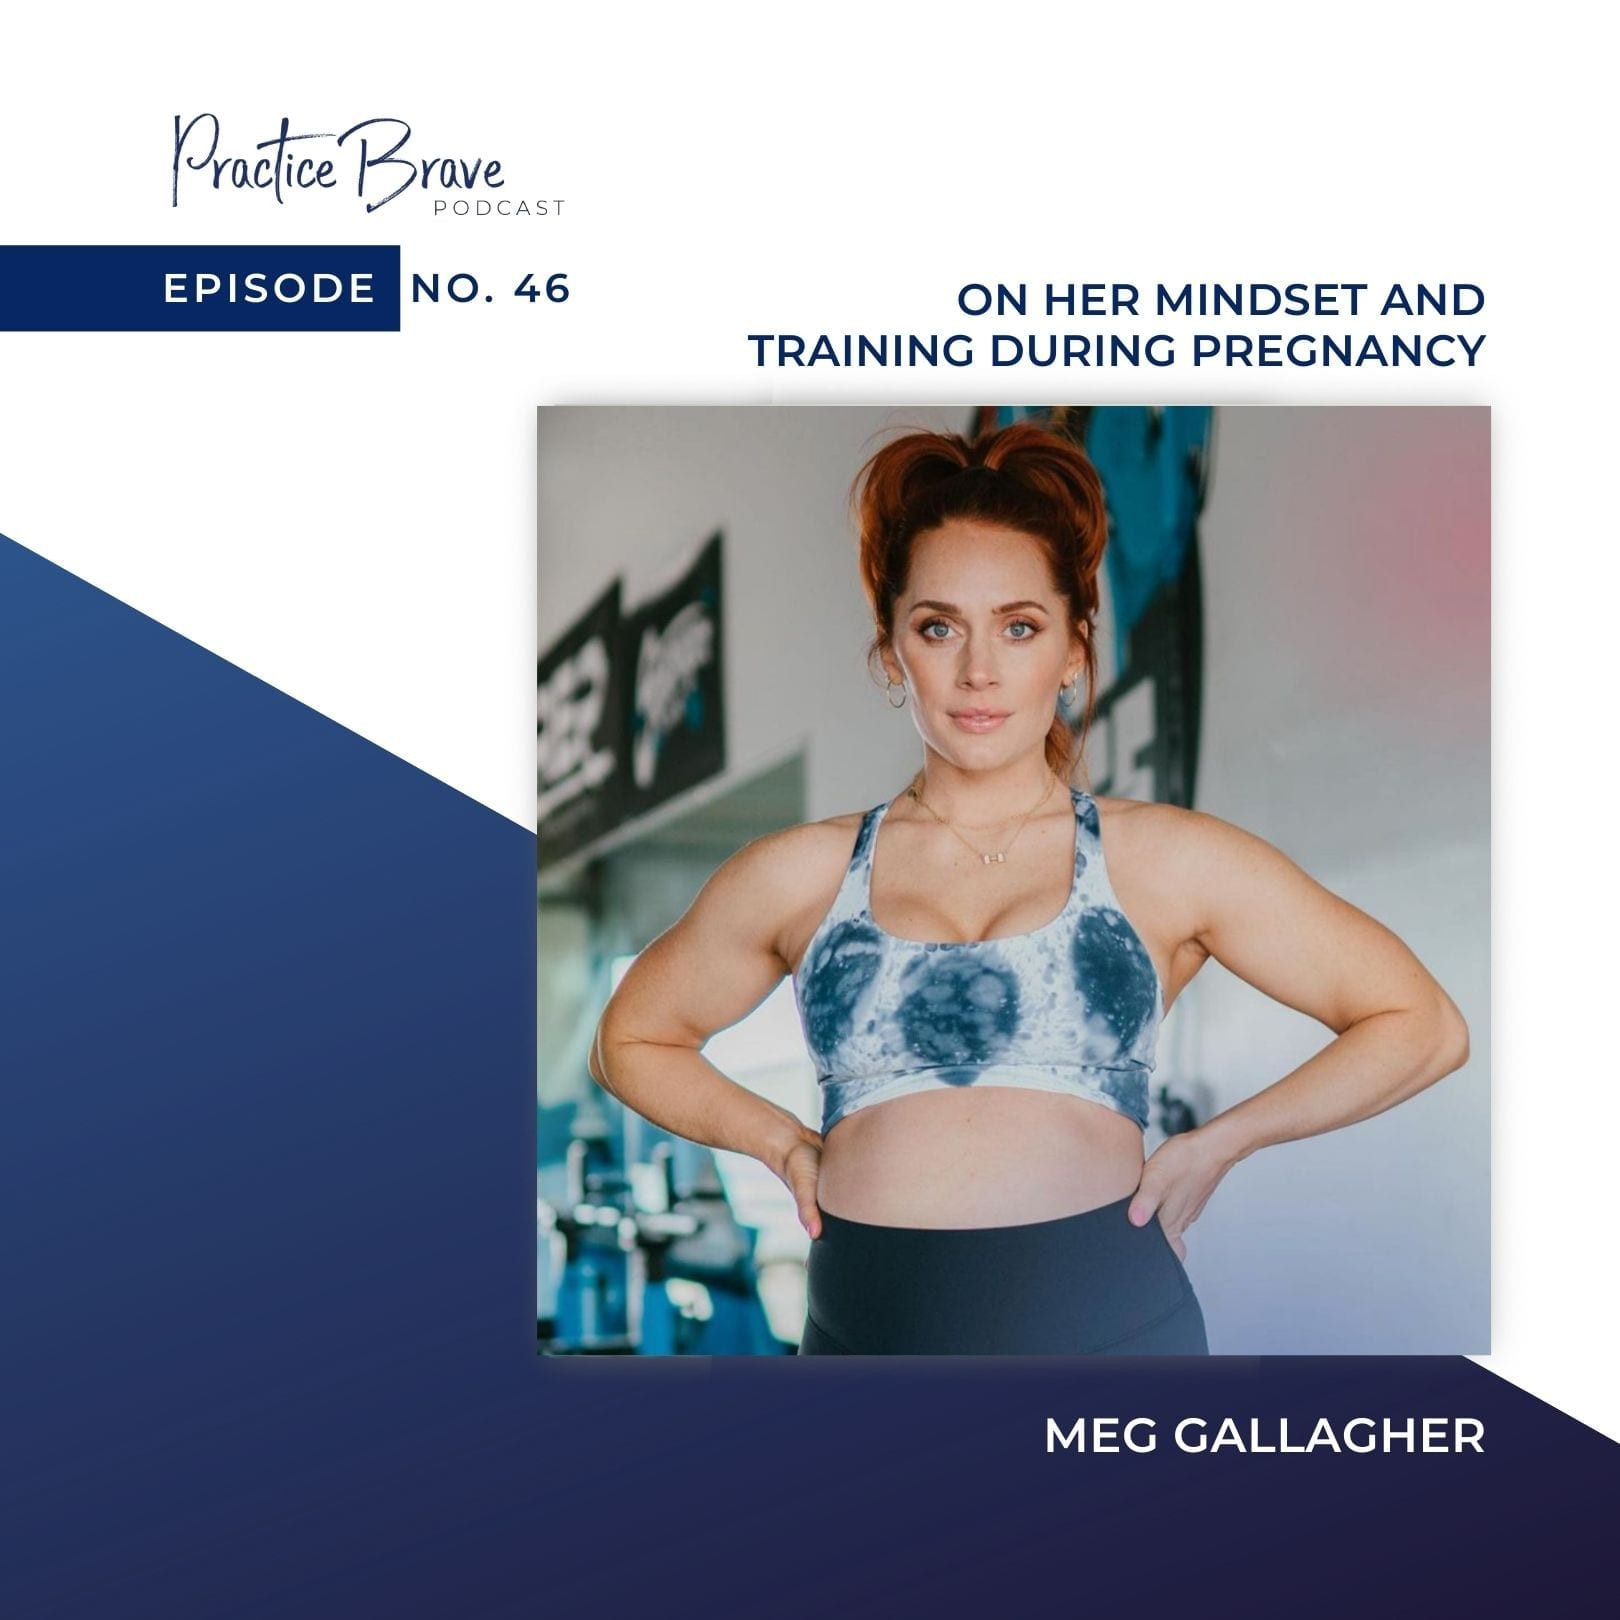 Episode 46: Meg Gallagher On Her Mindset And Training During Pregnancy